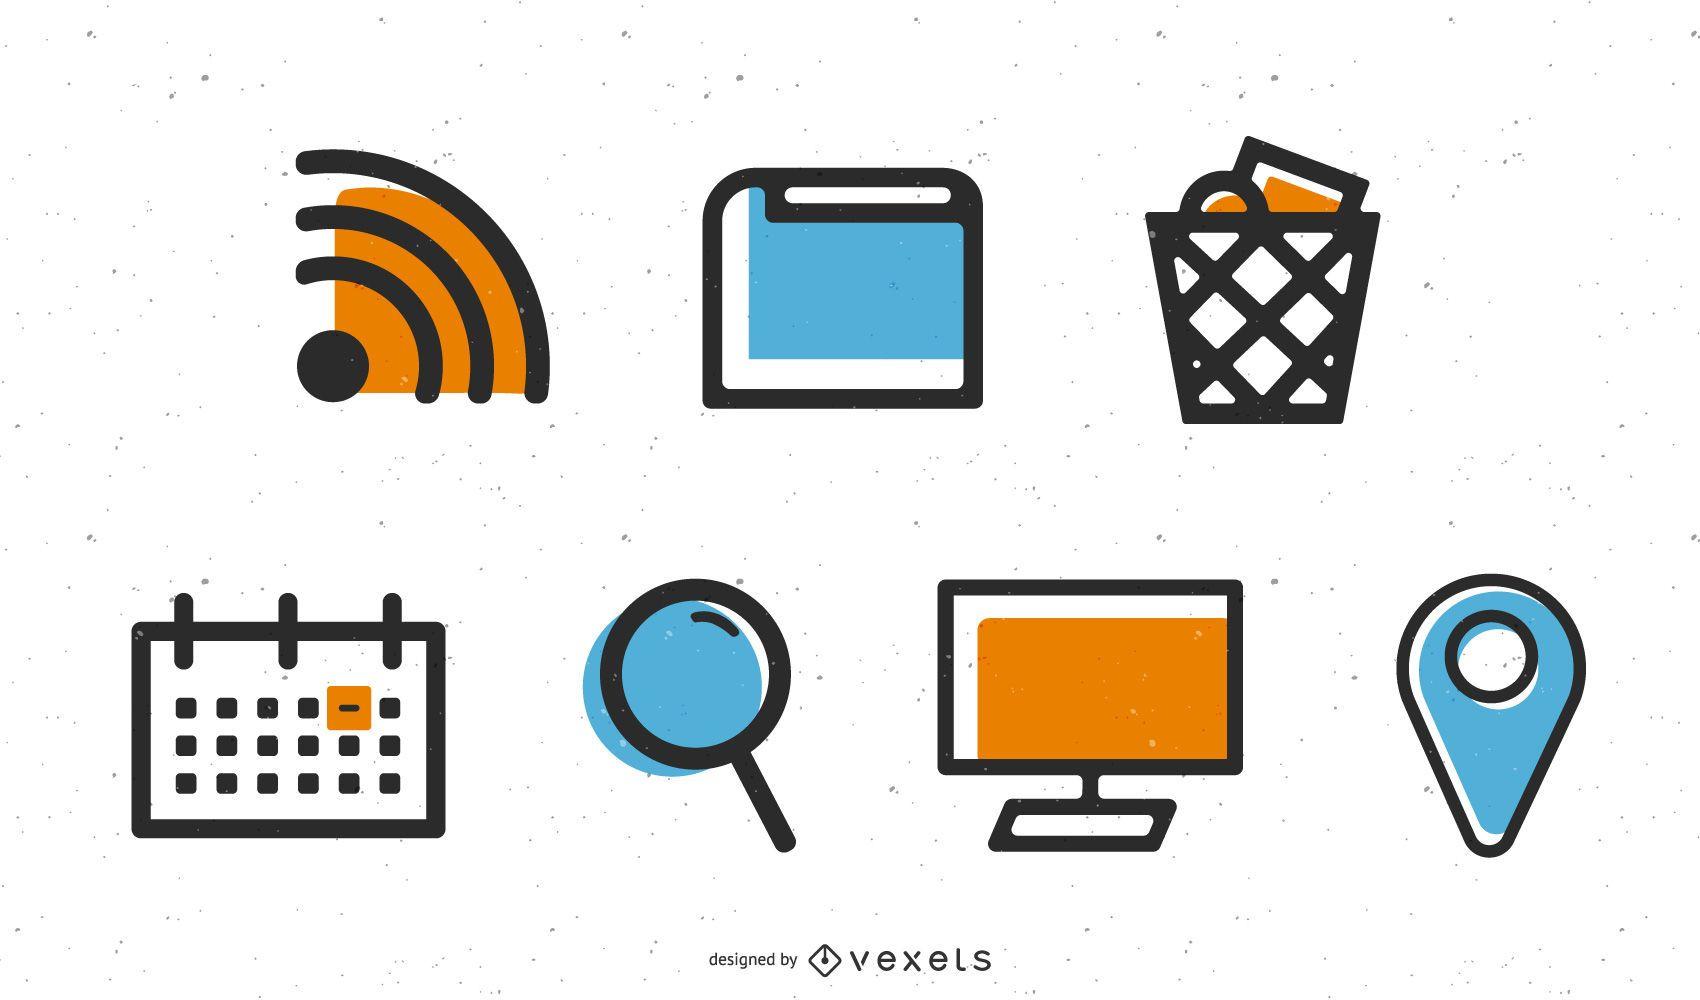 Desktop Vector Icon Pack